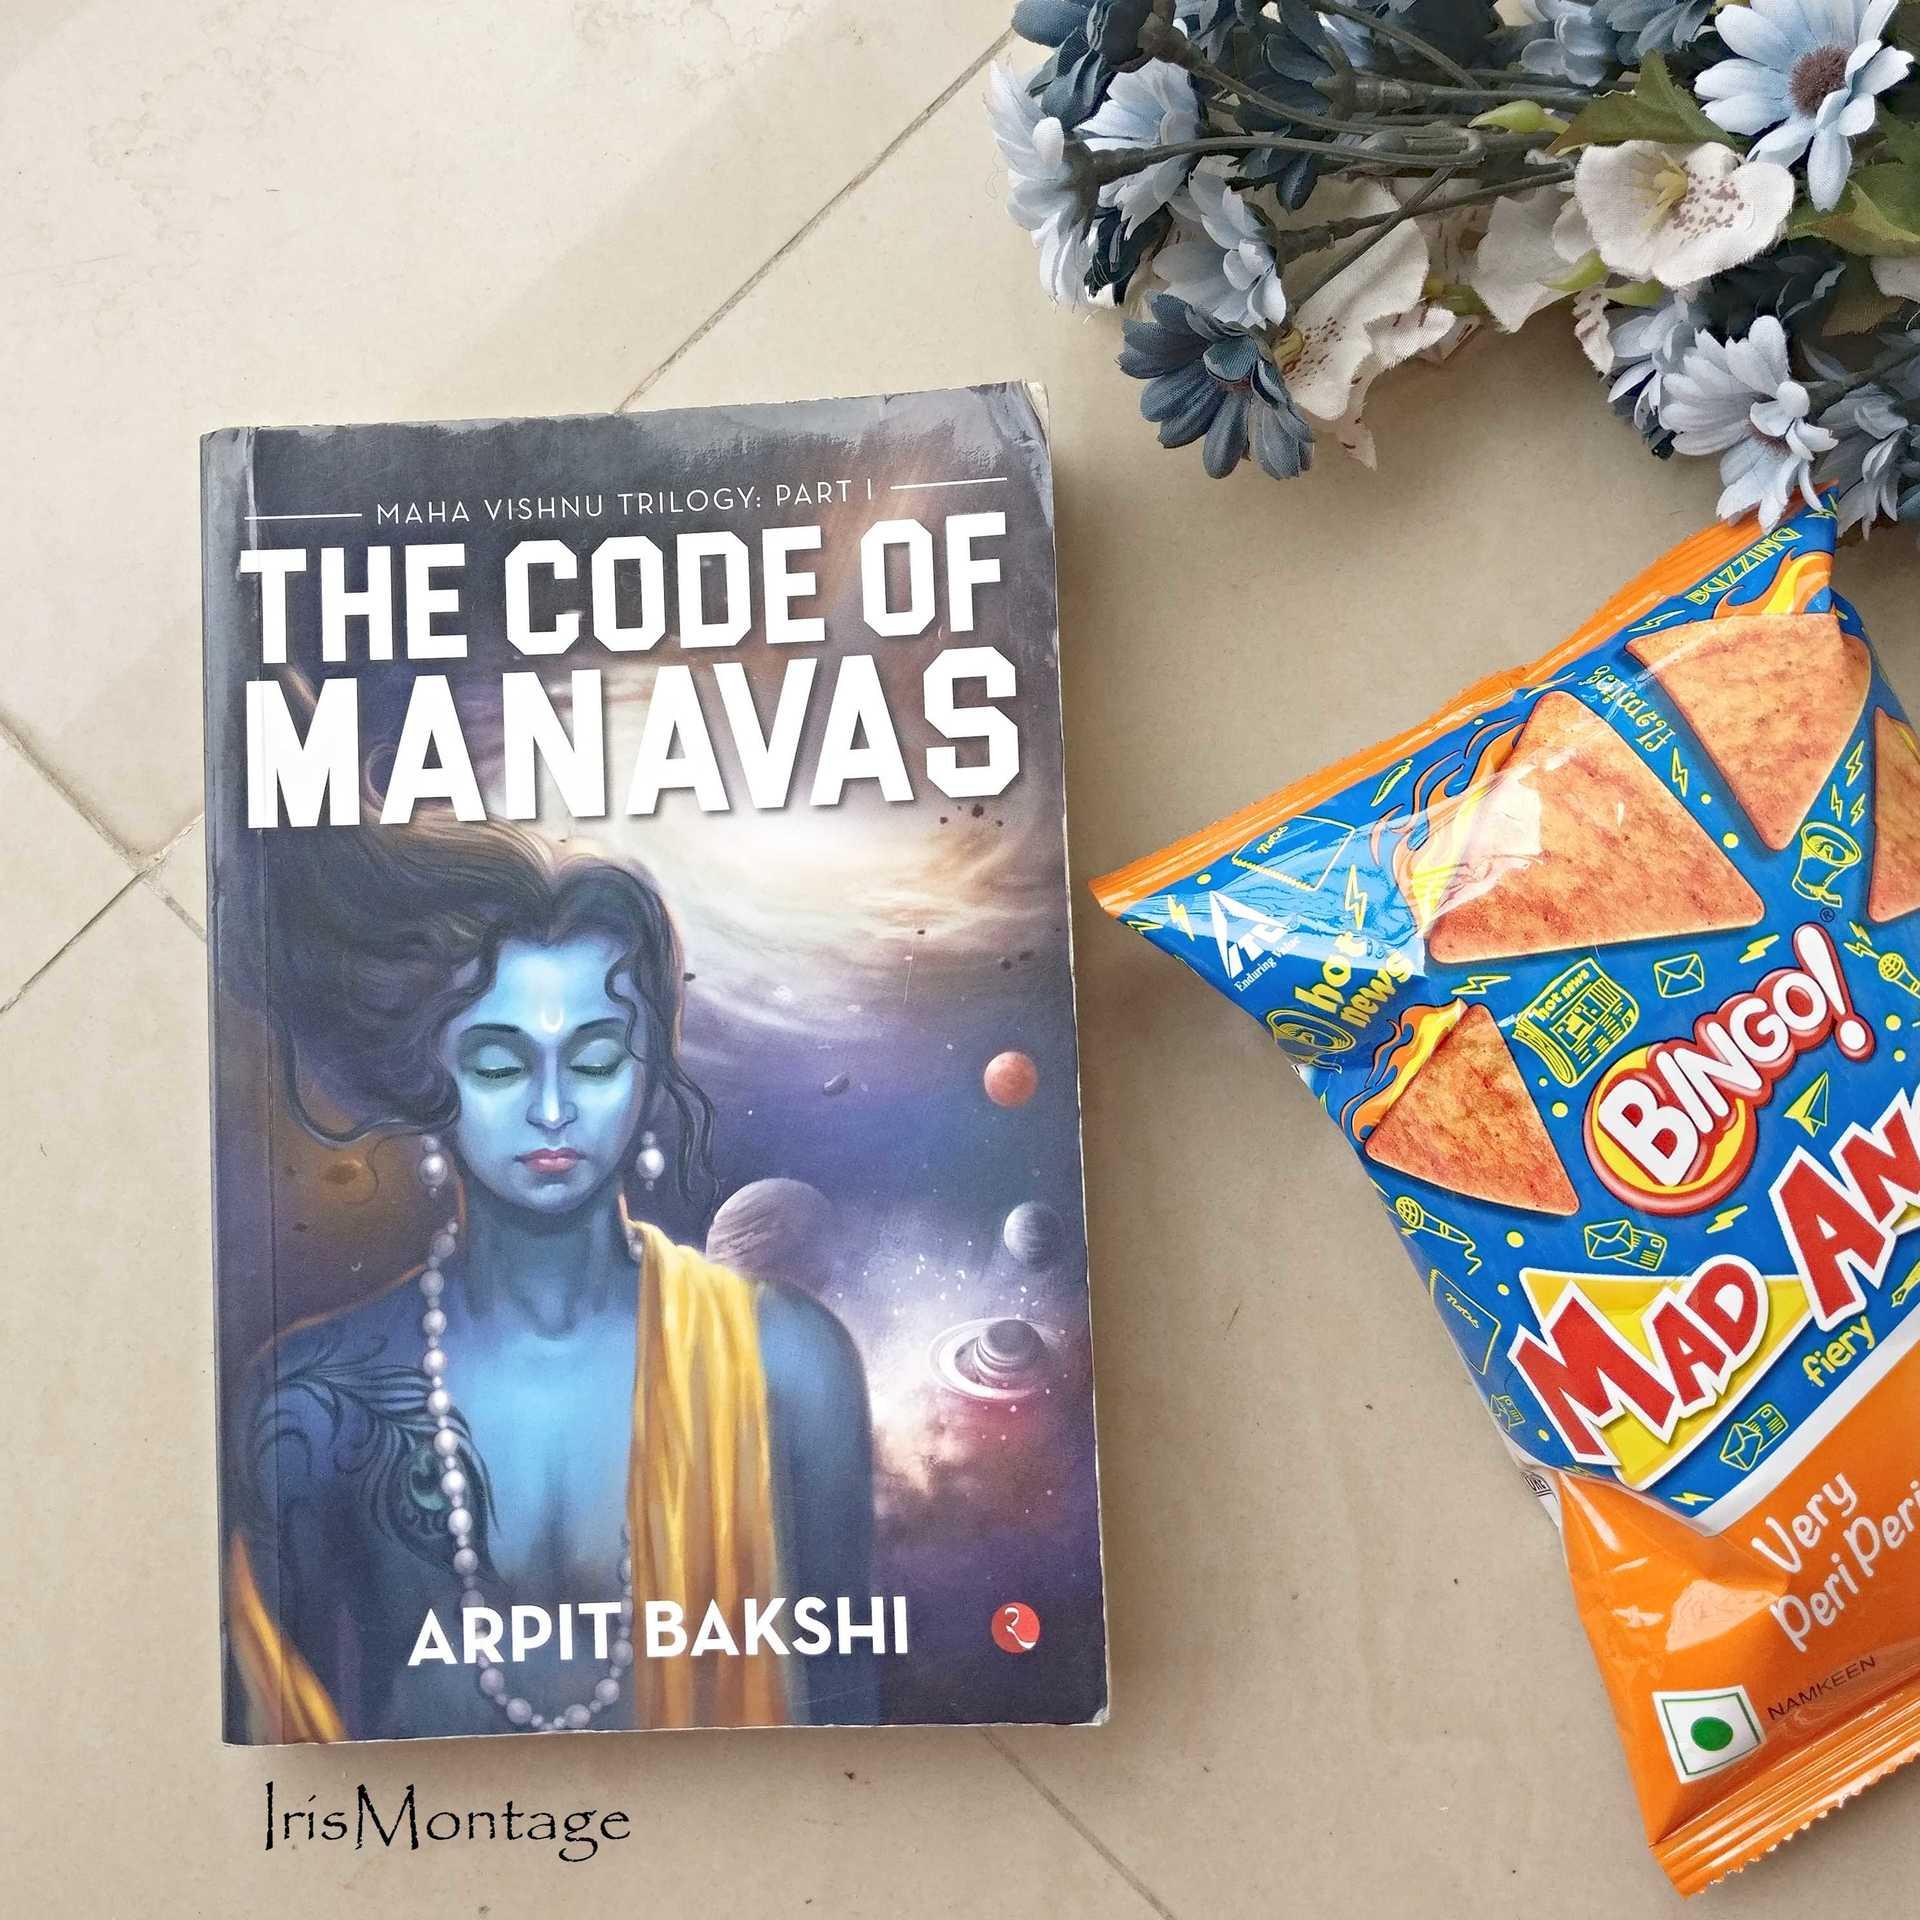 IrisMontage - The_Code_Of_Manavas_arpit bakshi